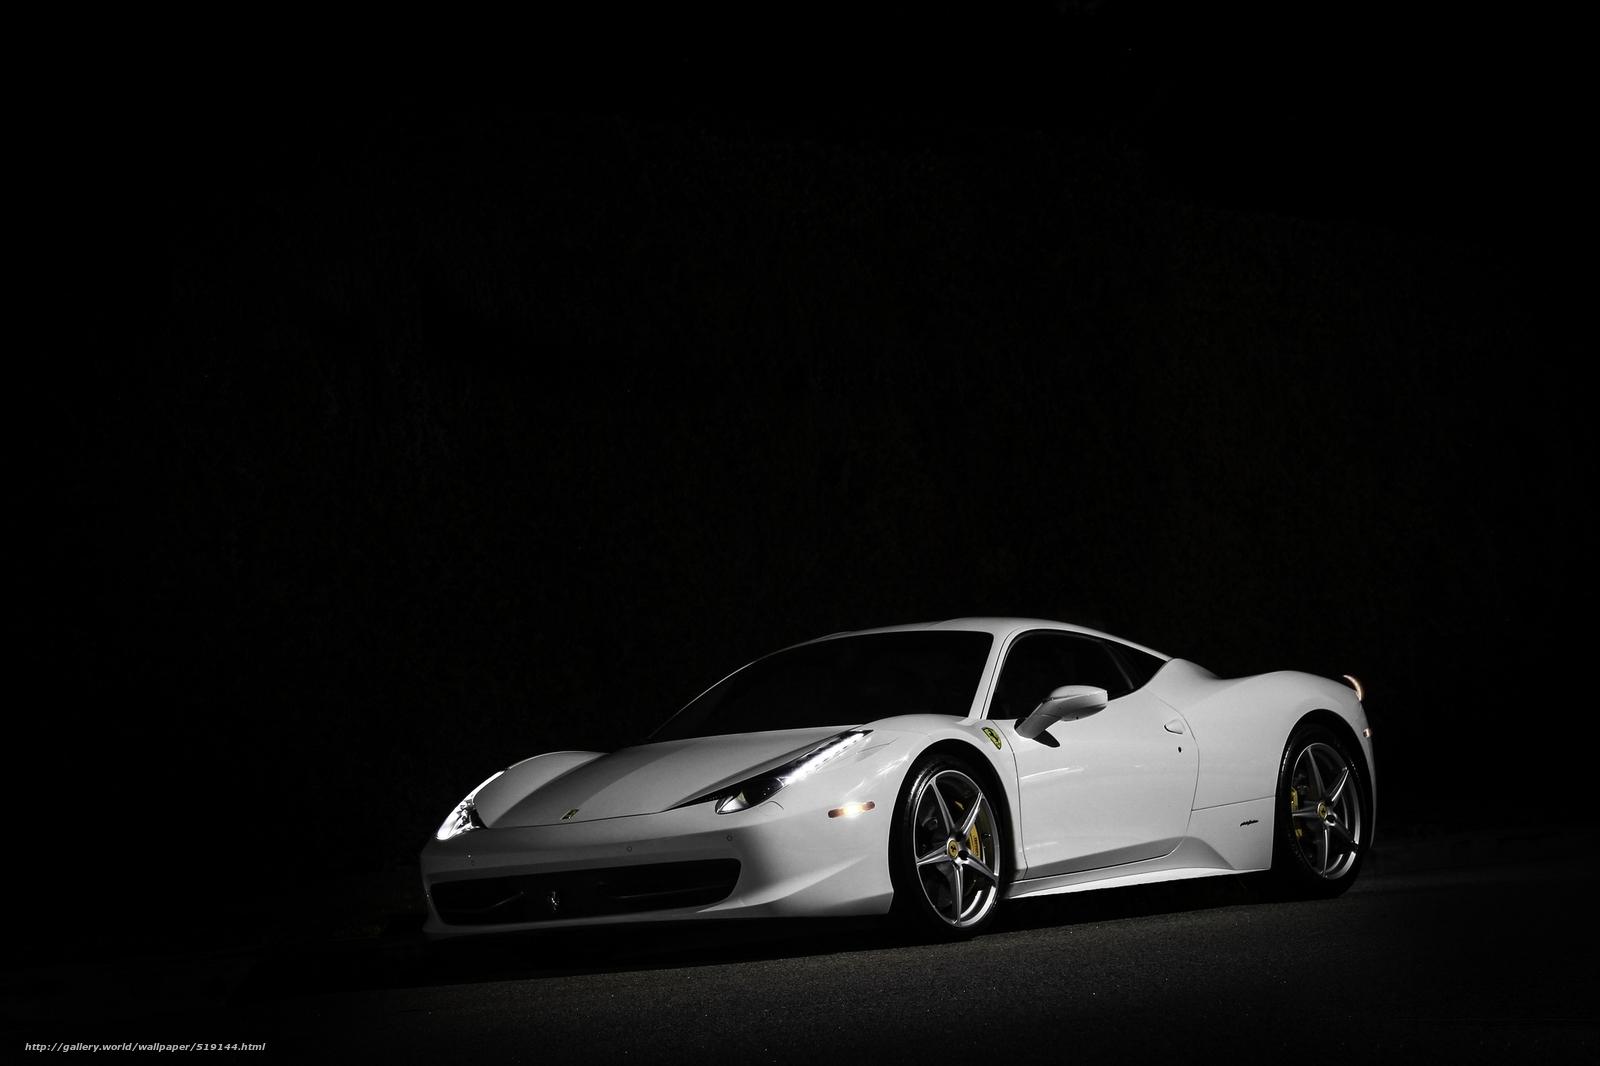 Download Red Black Ferrari 2048 X 2048 Wallpapers: Tlcharger Fond D'ecran Blanc, Italie, Phares, Ferrari